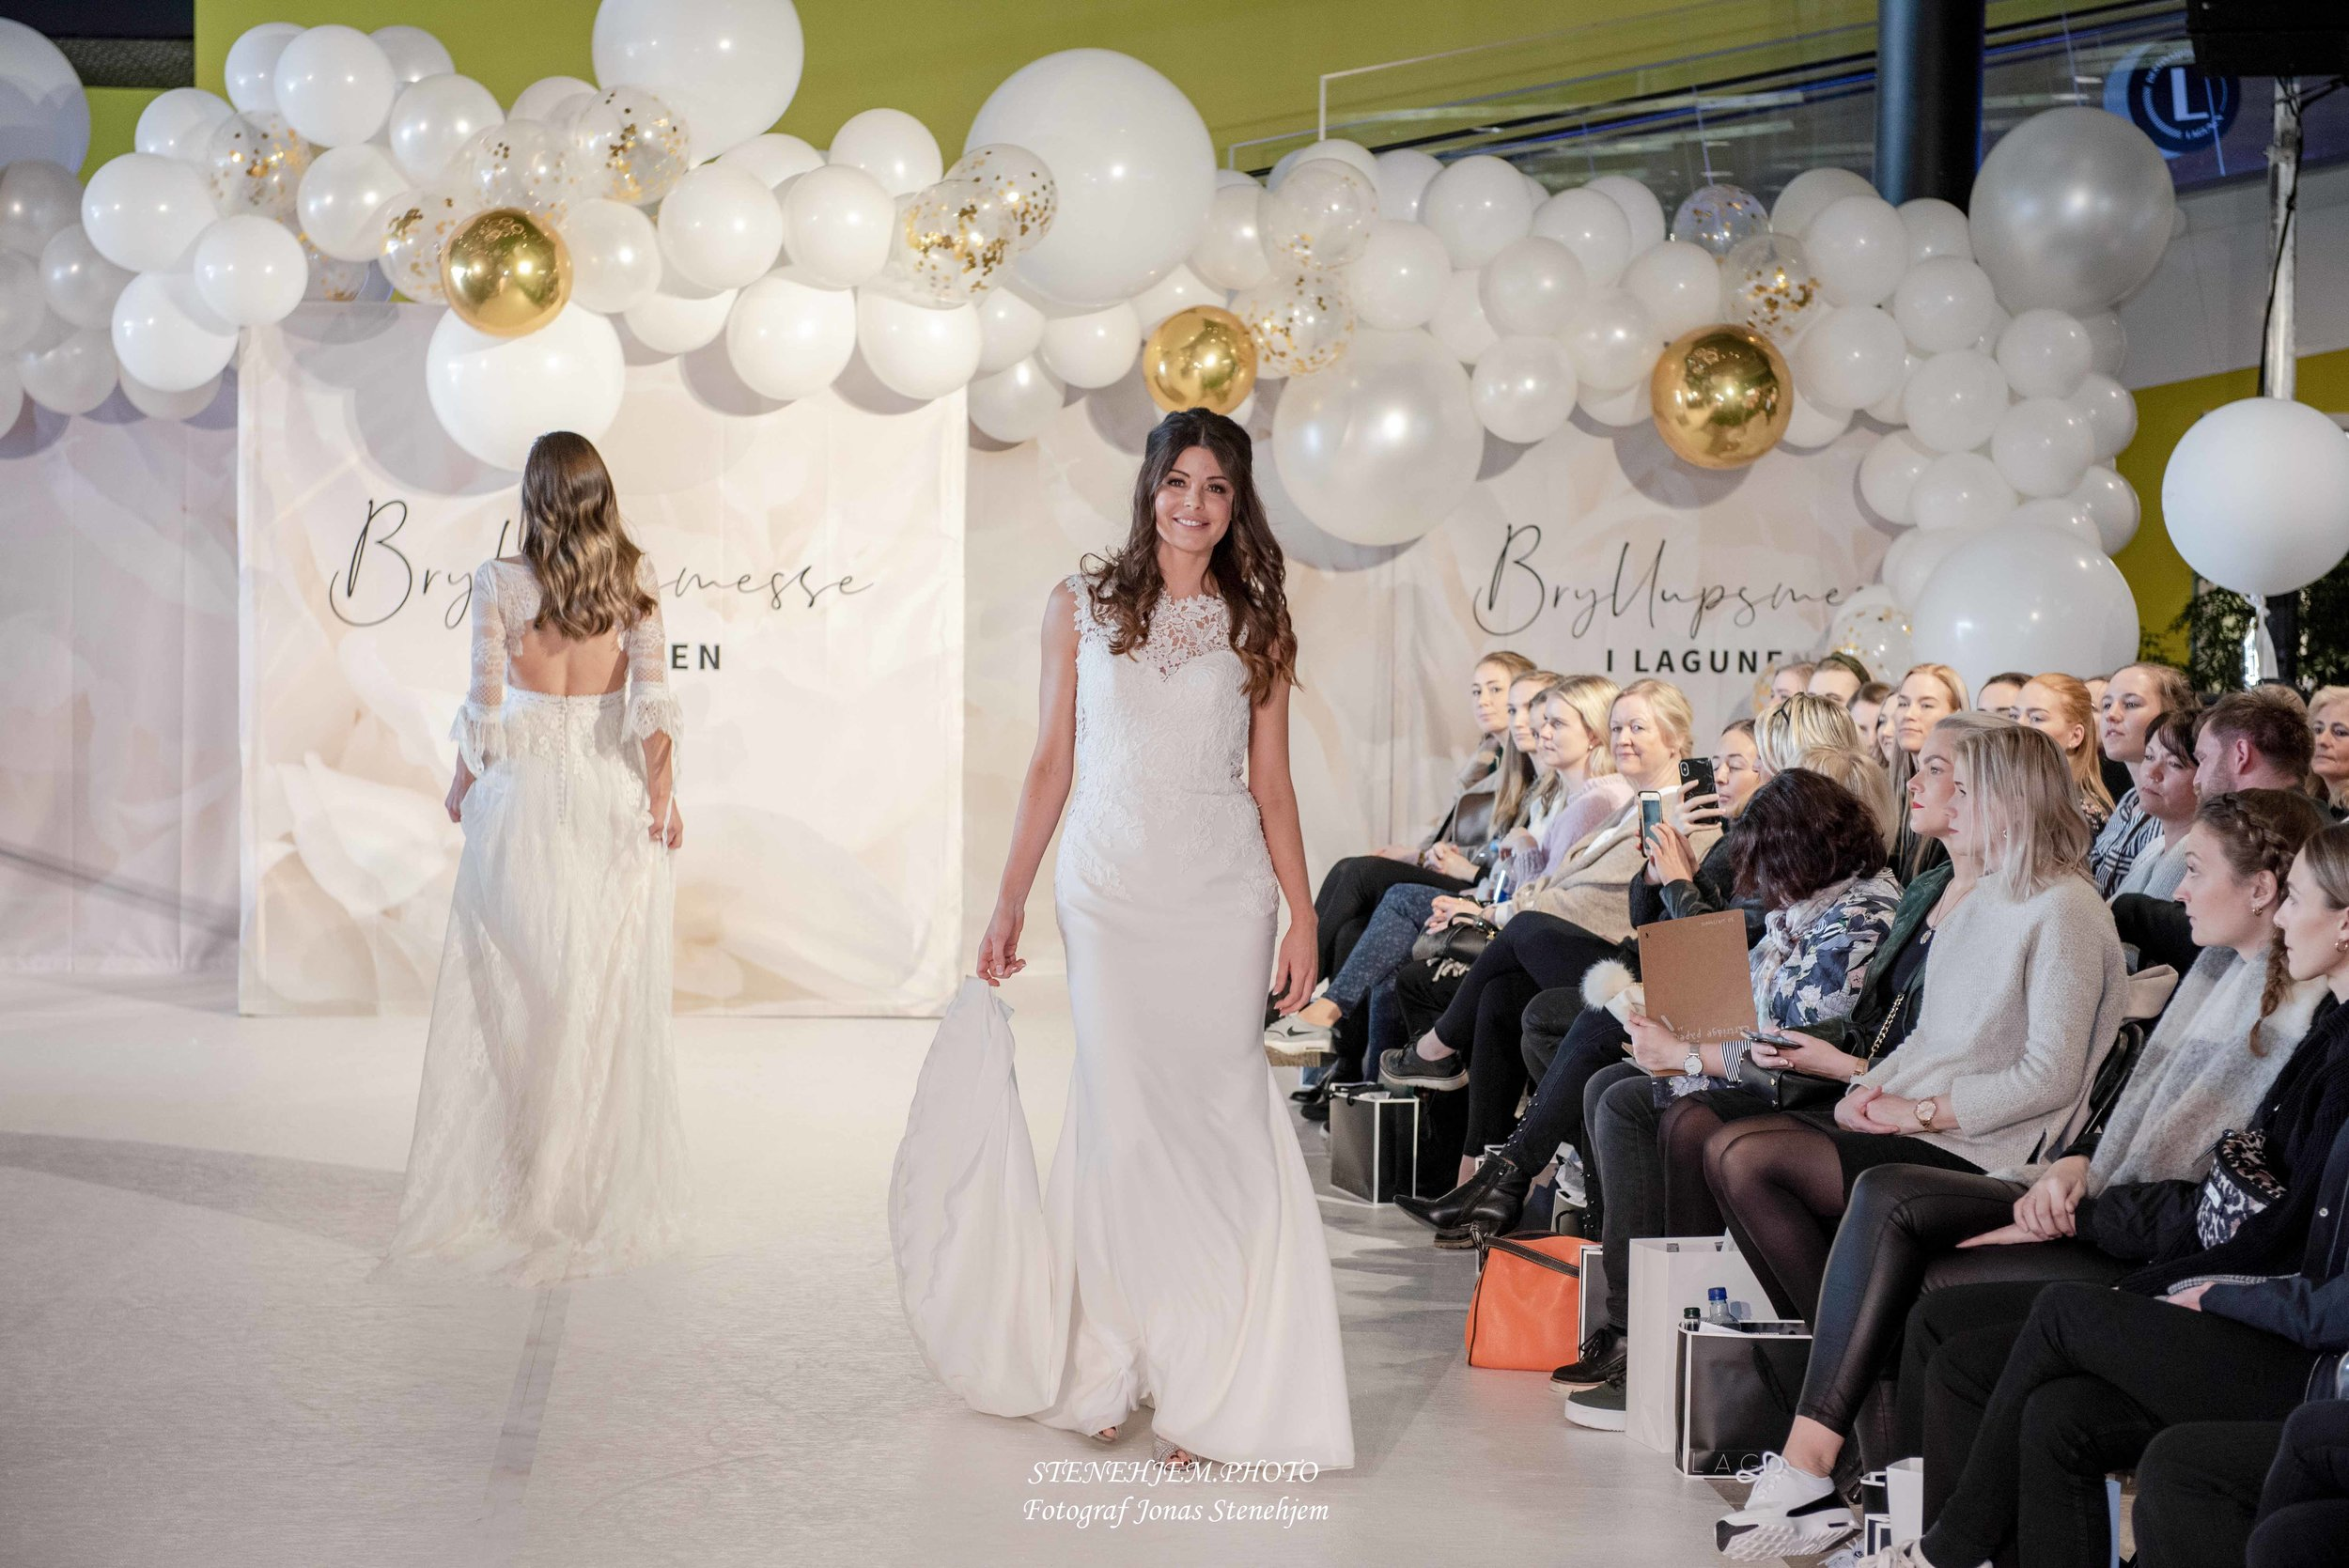 Bryllupsmesse_Lagunen_mittaltweddingfair__073.jpg